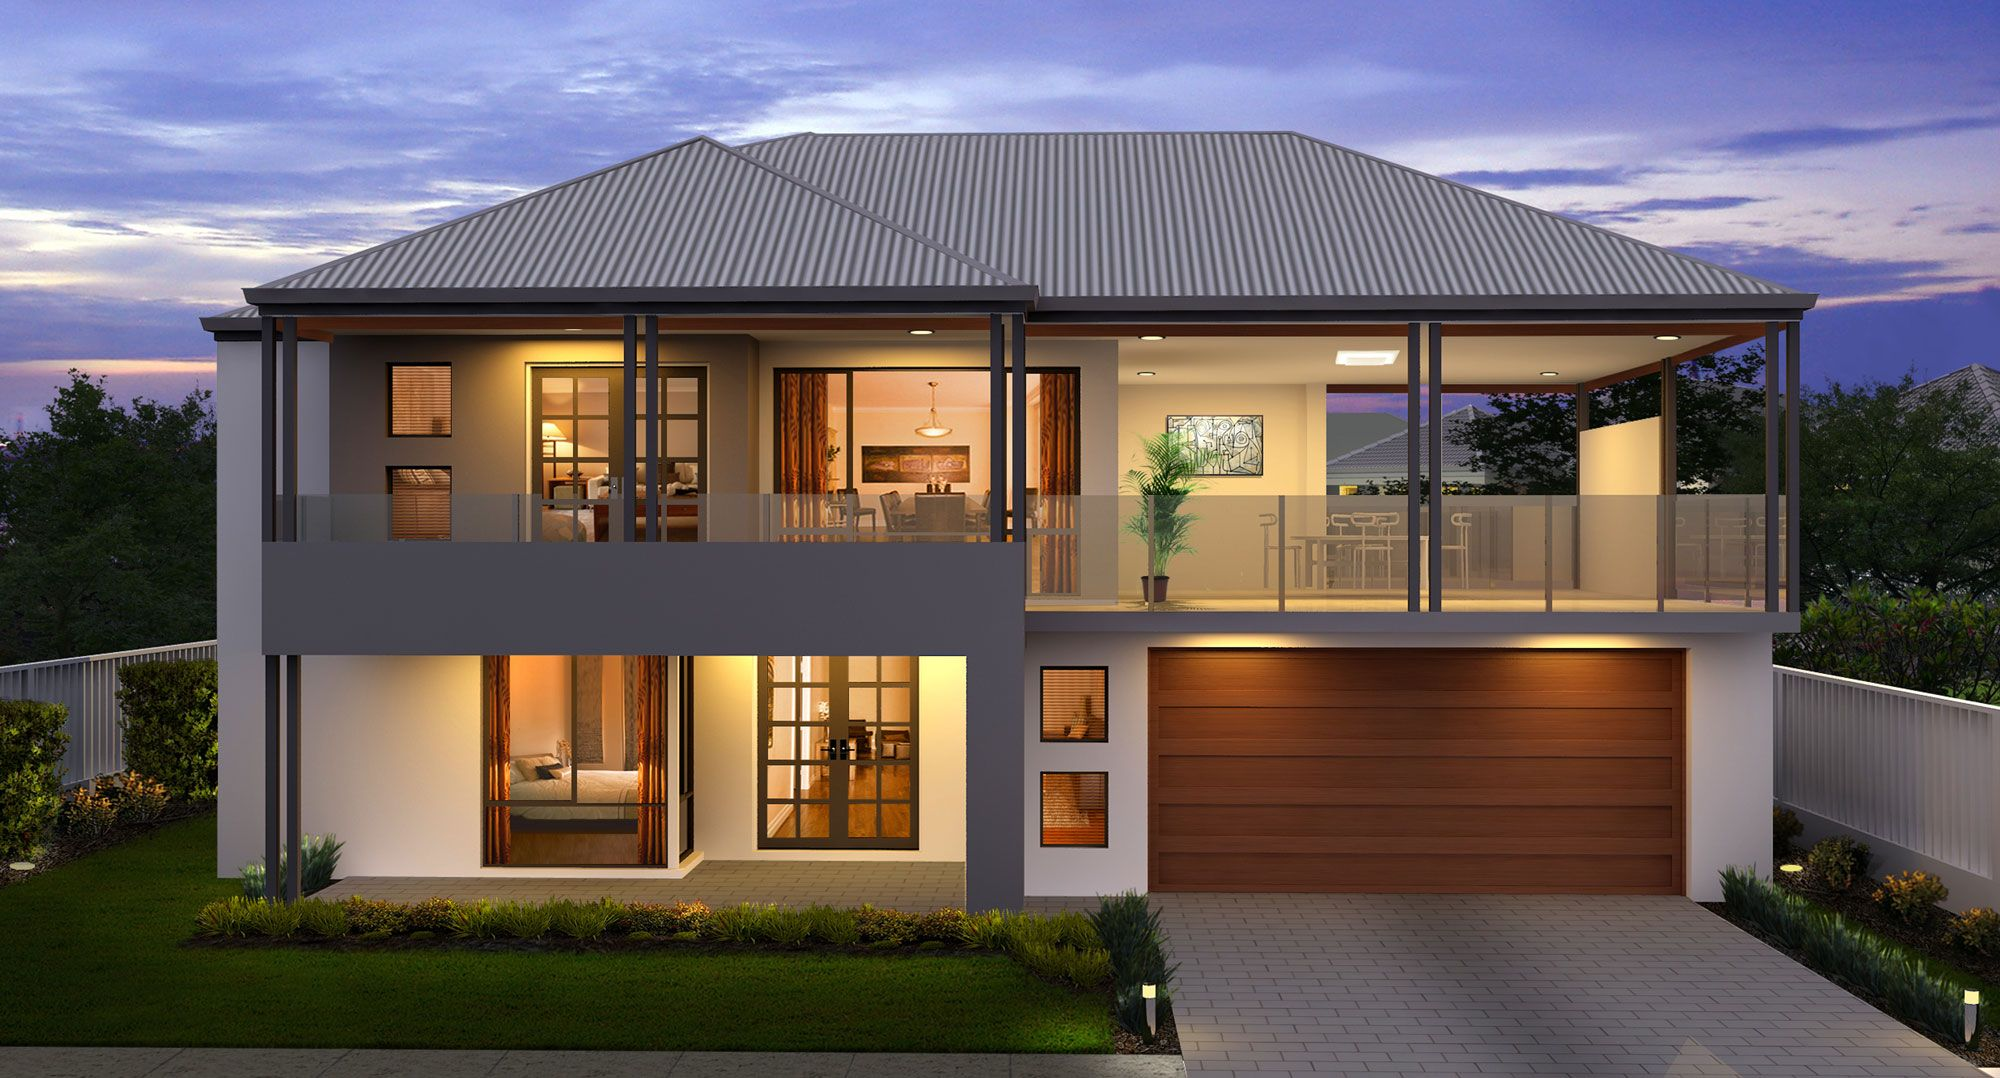 Two Storey Home Builders Mandurah & Perth | Two story ...